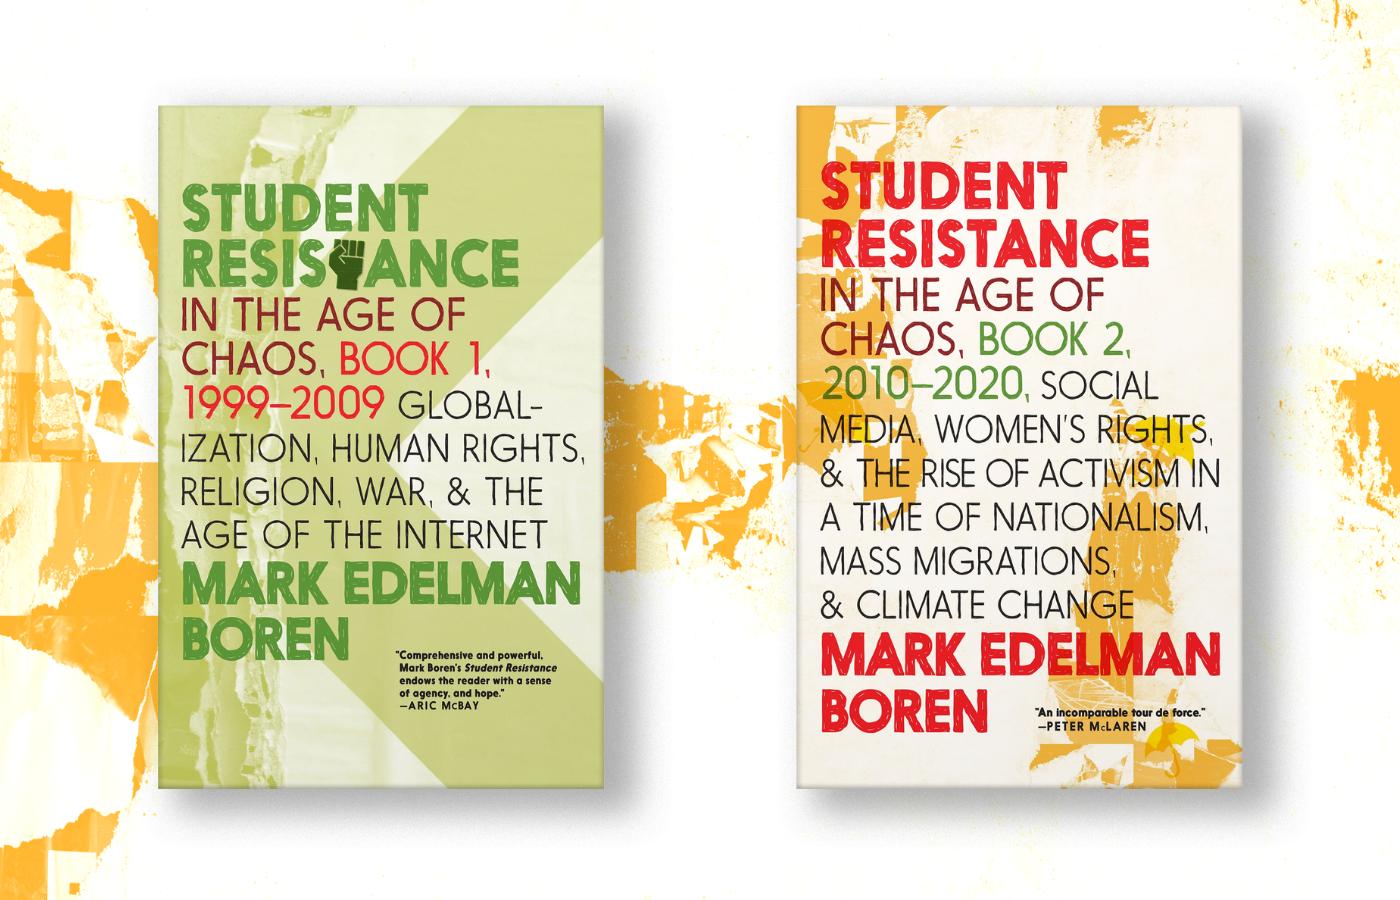 Student_resistance-